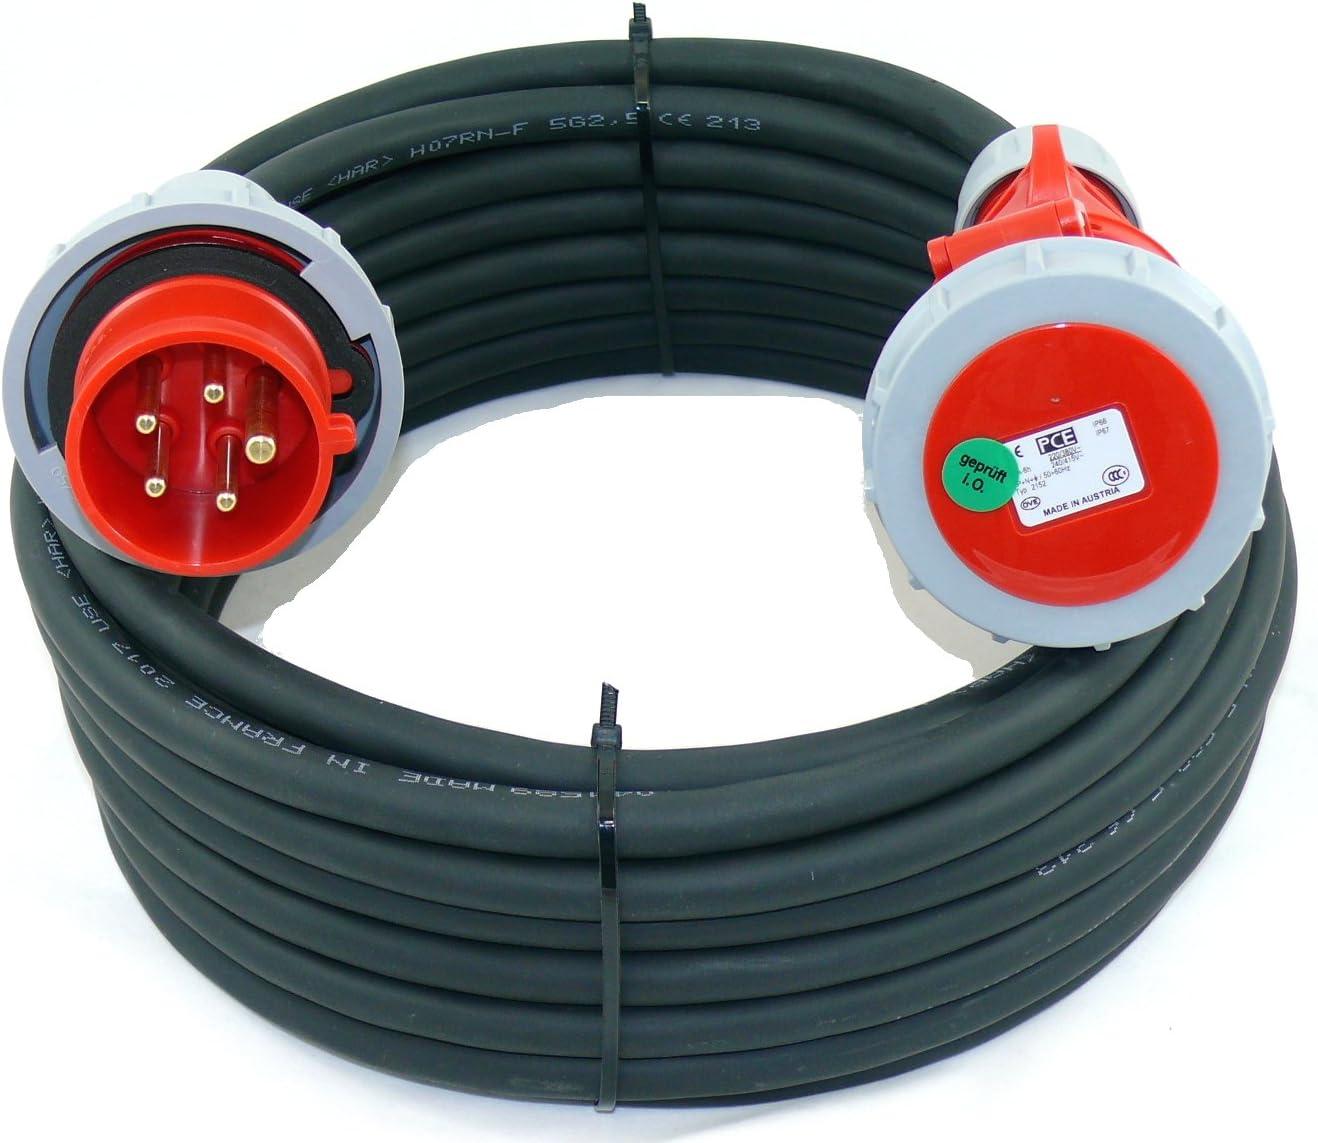 CEE Verl/ängerungskabel wasserdicht H07NR 5G2,5 5x2,5 16A PCE IP67 5m